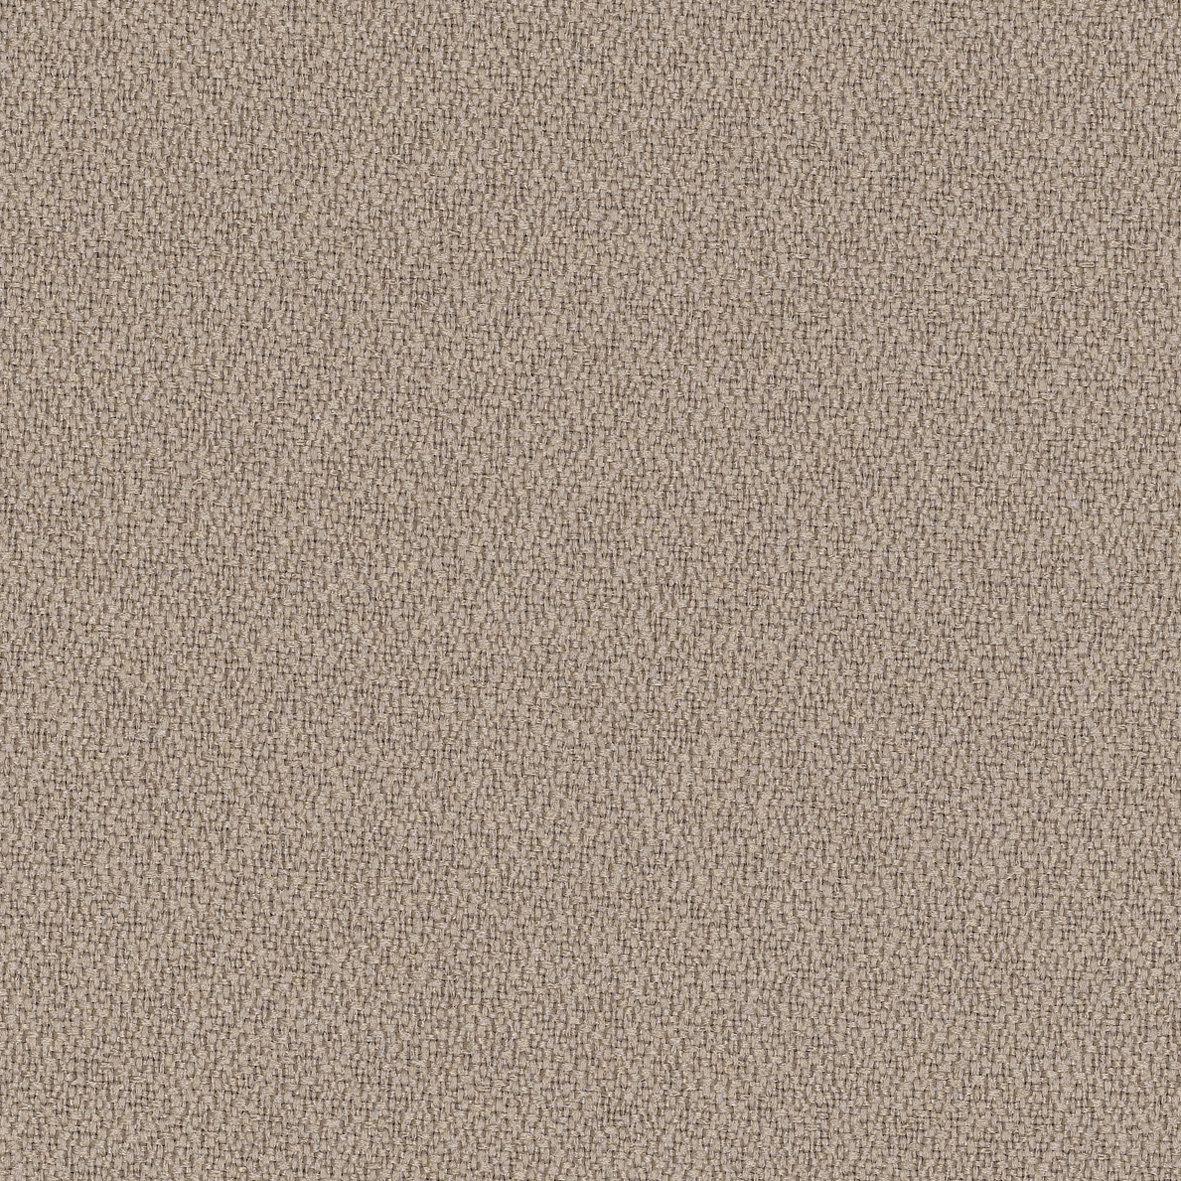 Softline bordskærmvæg beige B600xH590 mm